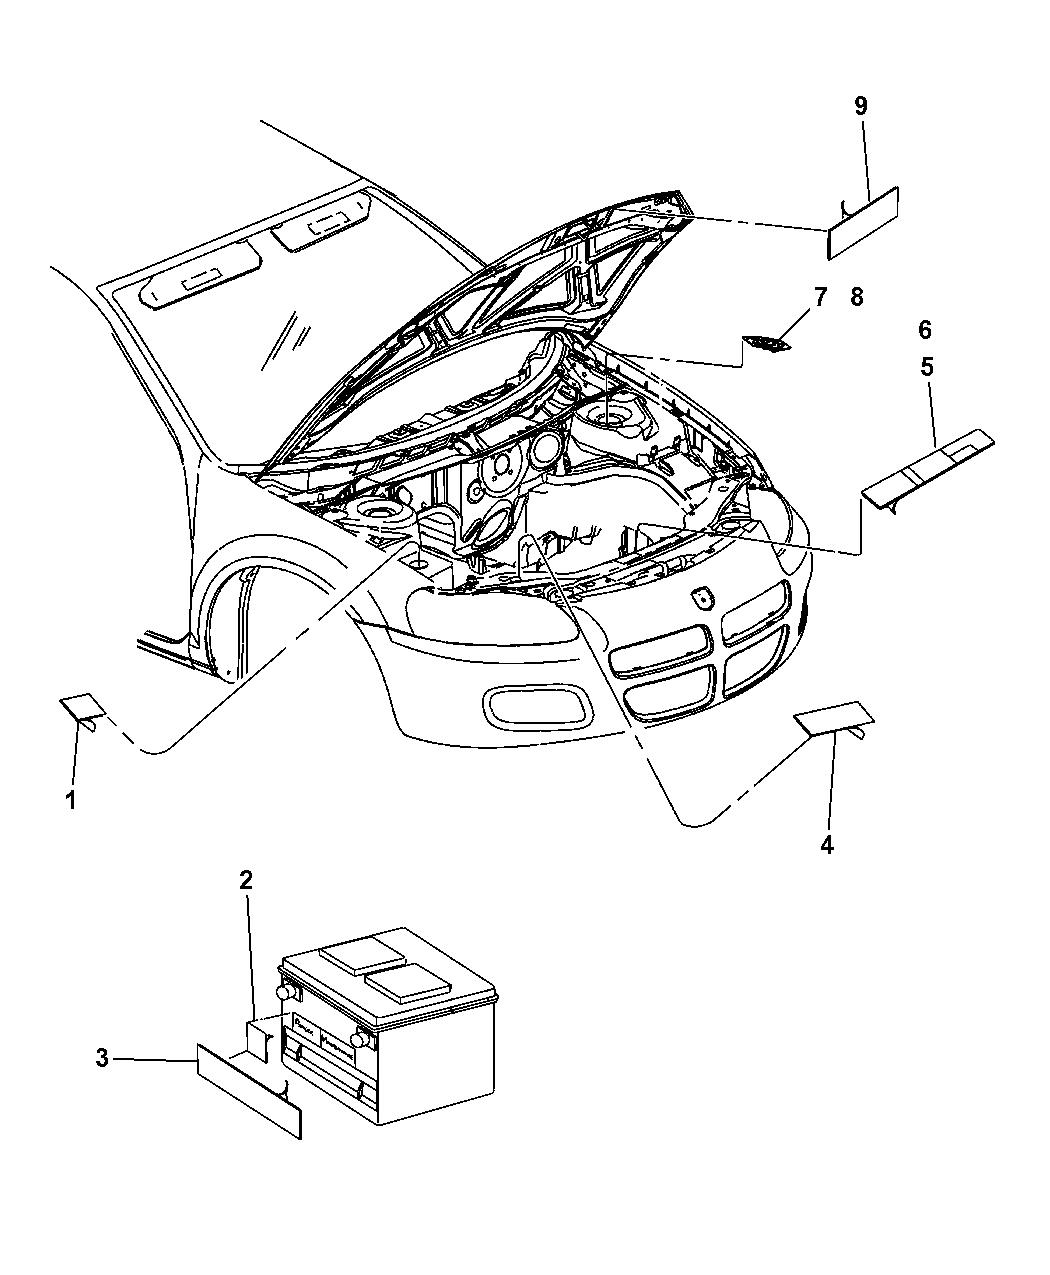 2004 chrysler sebring sedan convertible engine compartment publicscrutiny Images